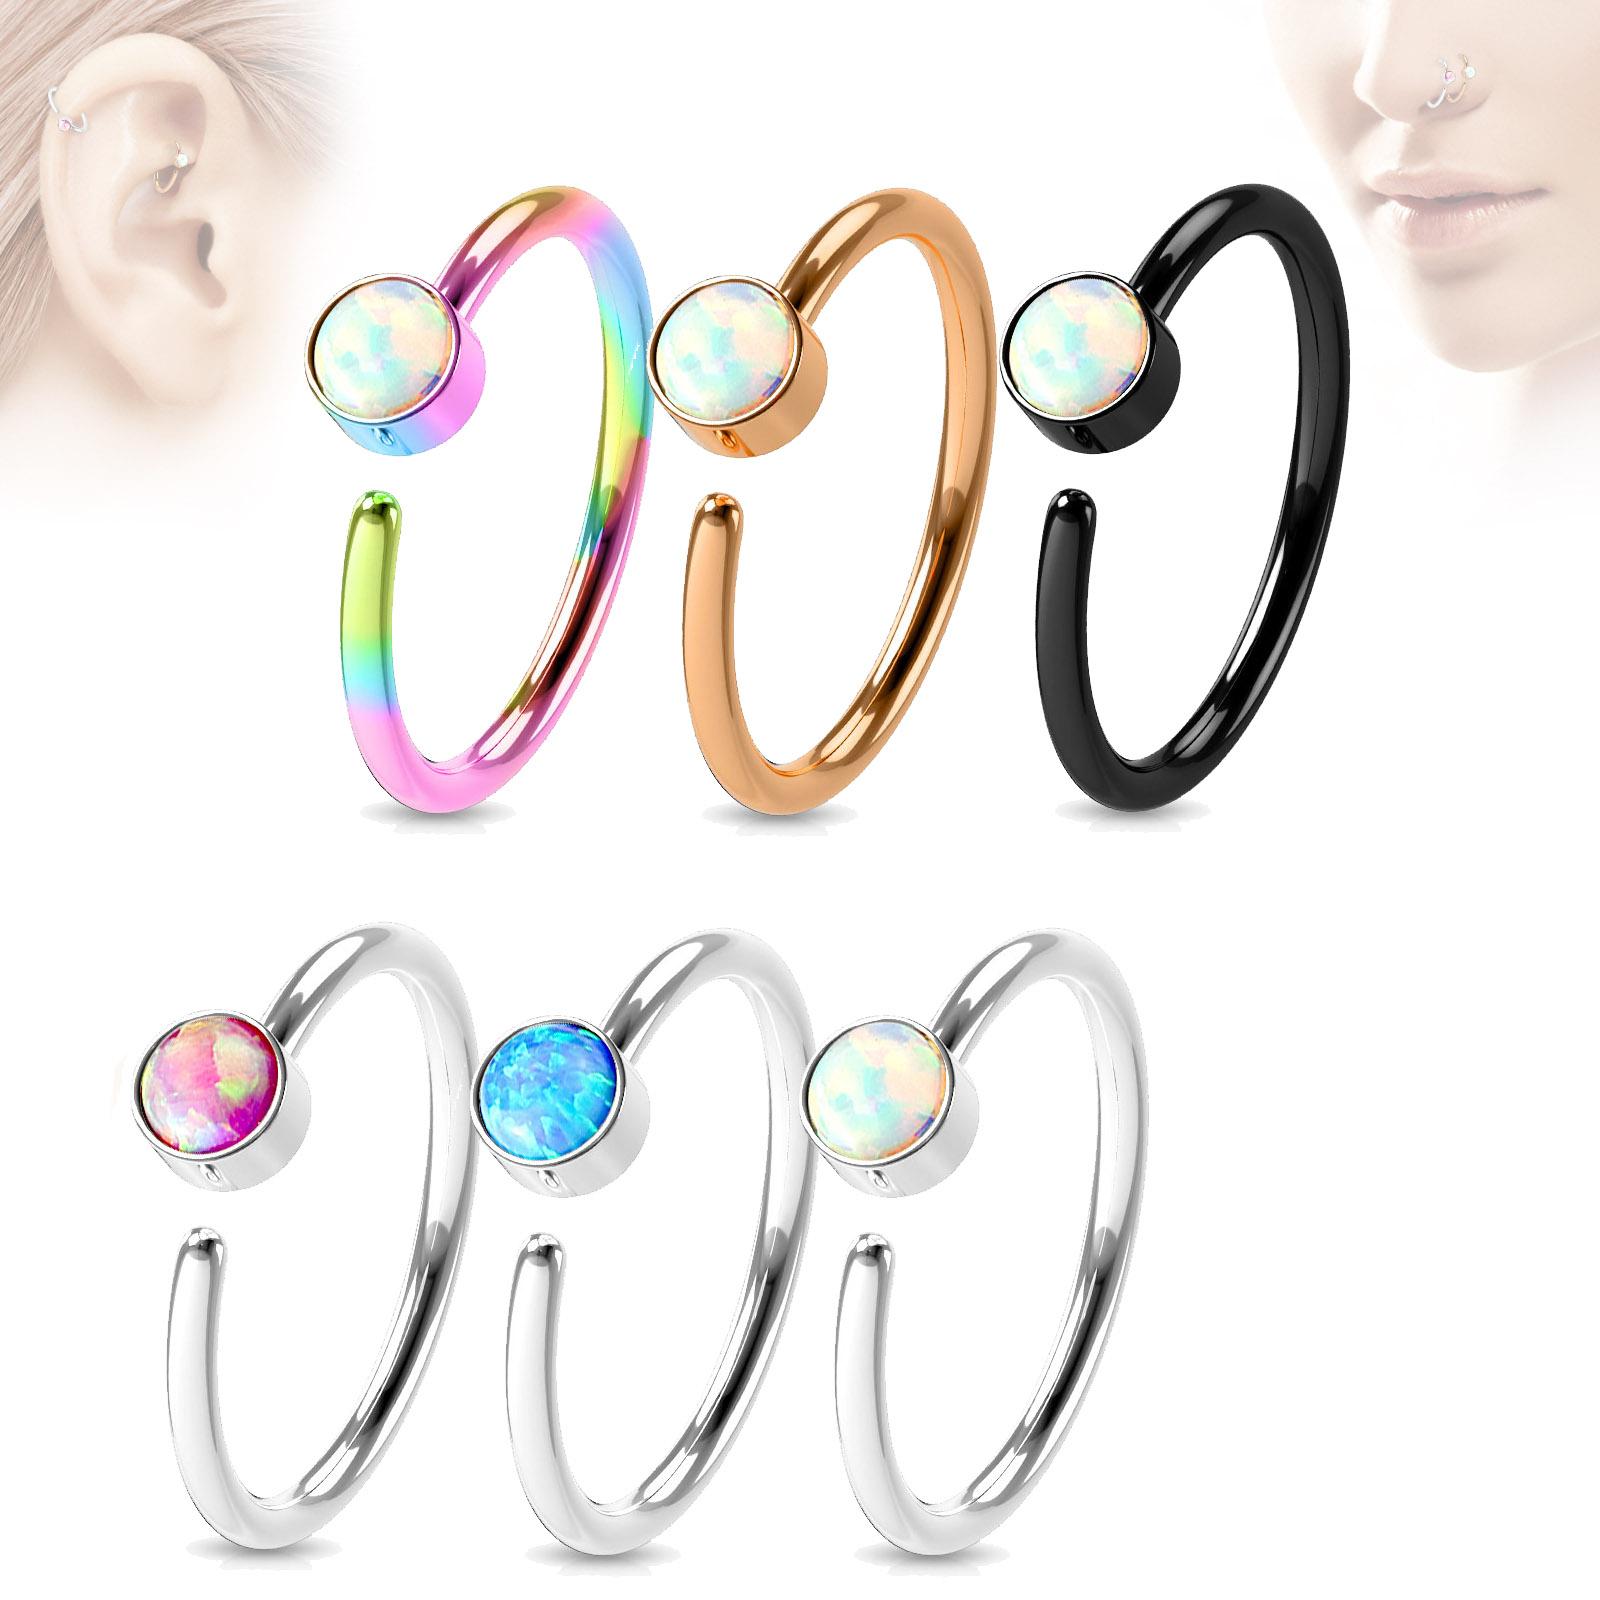 1,2 x 8 mm Lippenbändchen Piercing Ring G23 Titan Zirkonia Helix Tragus BCR Z230